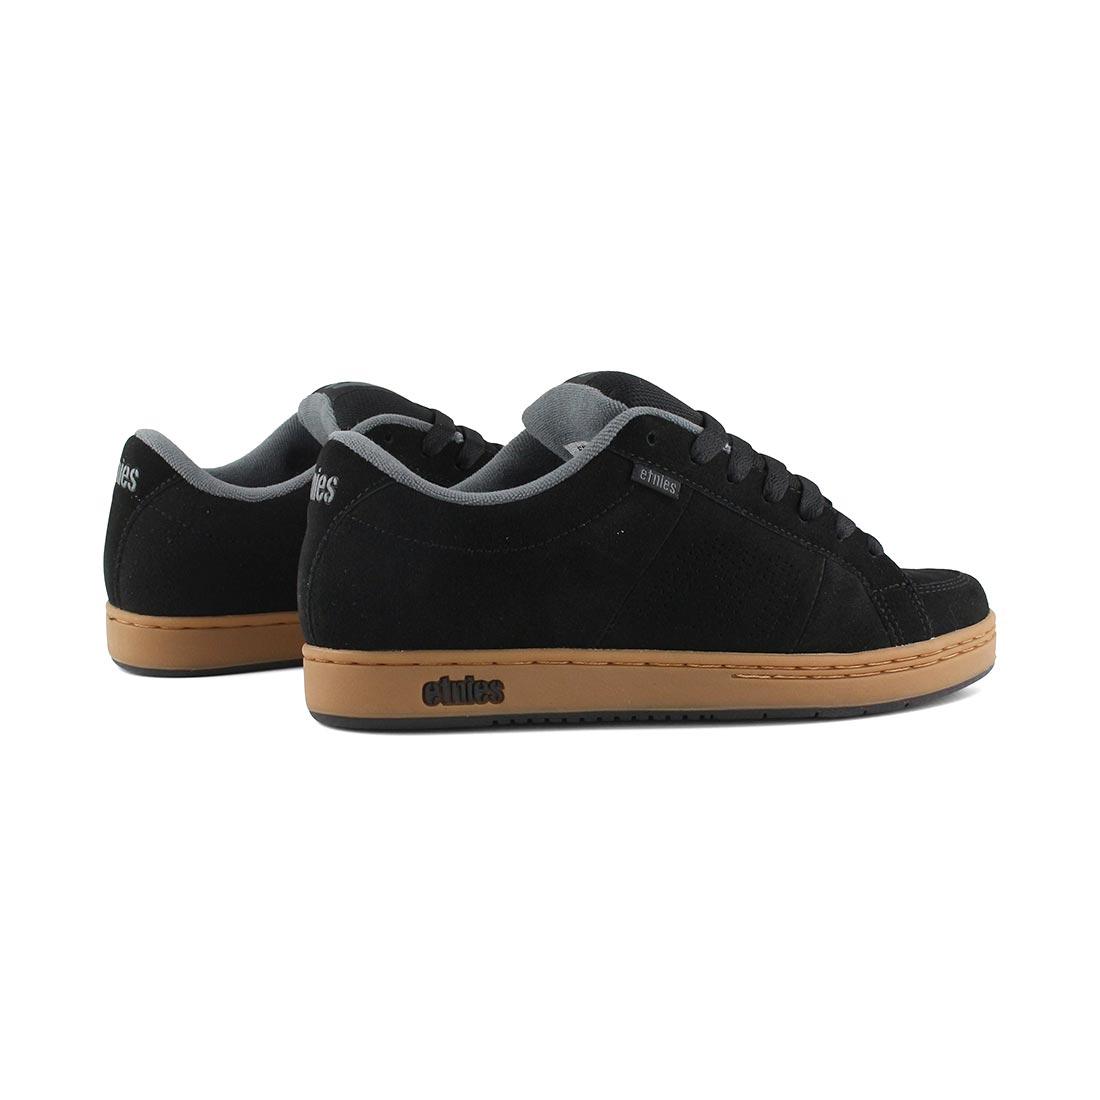 9fc3635a337 ... Etnies-Kingpin-Shoes-Black-Gum-Dark-Grey- ...